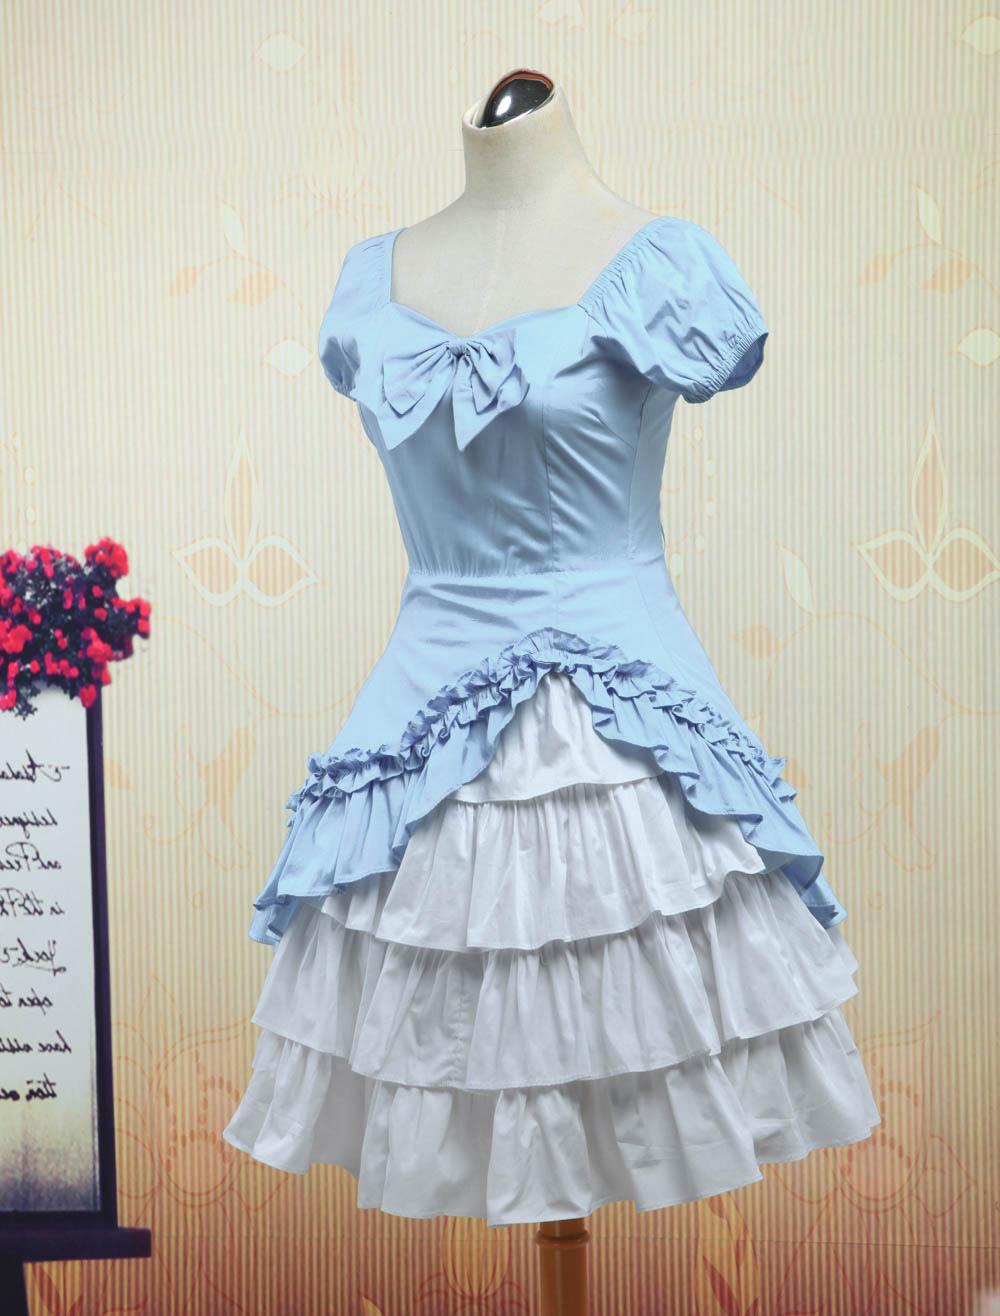 Wine White Lolita OP Dress Short Sleeves withe Ruffles - Milanoo.com